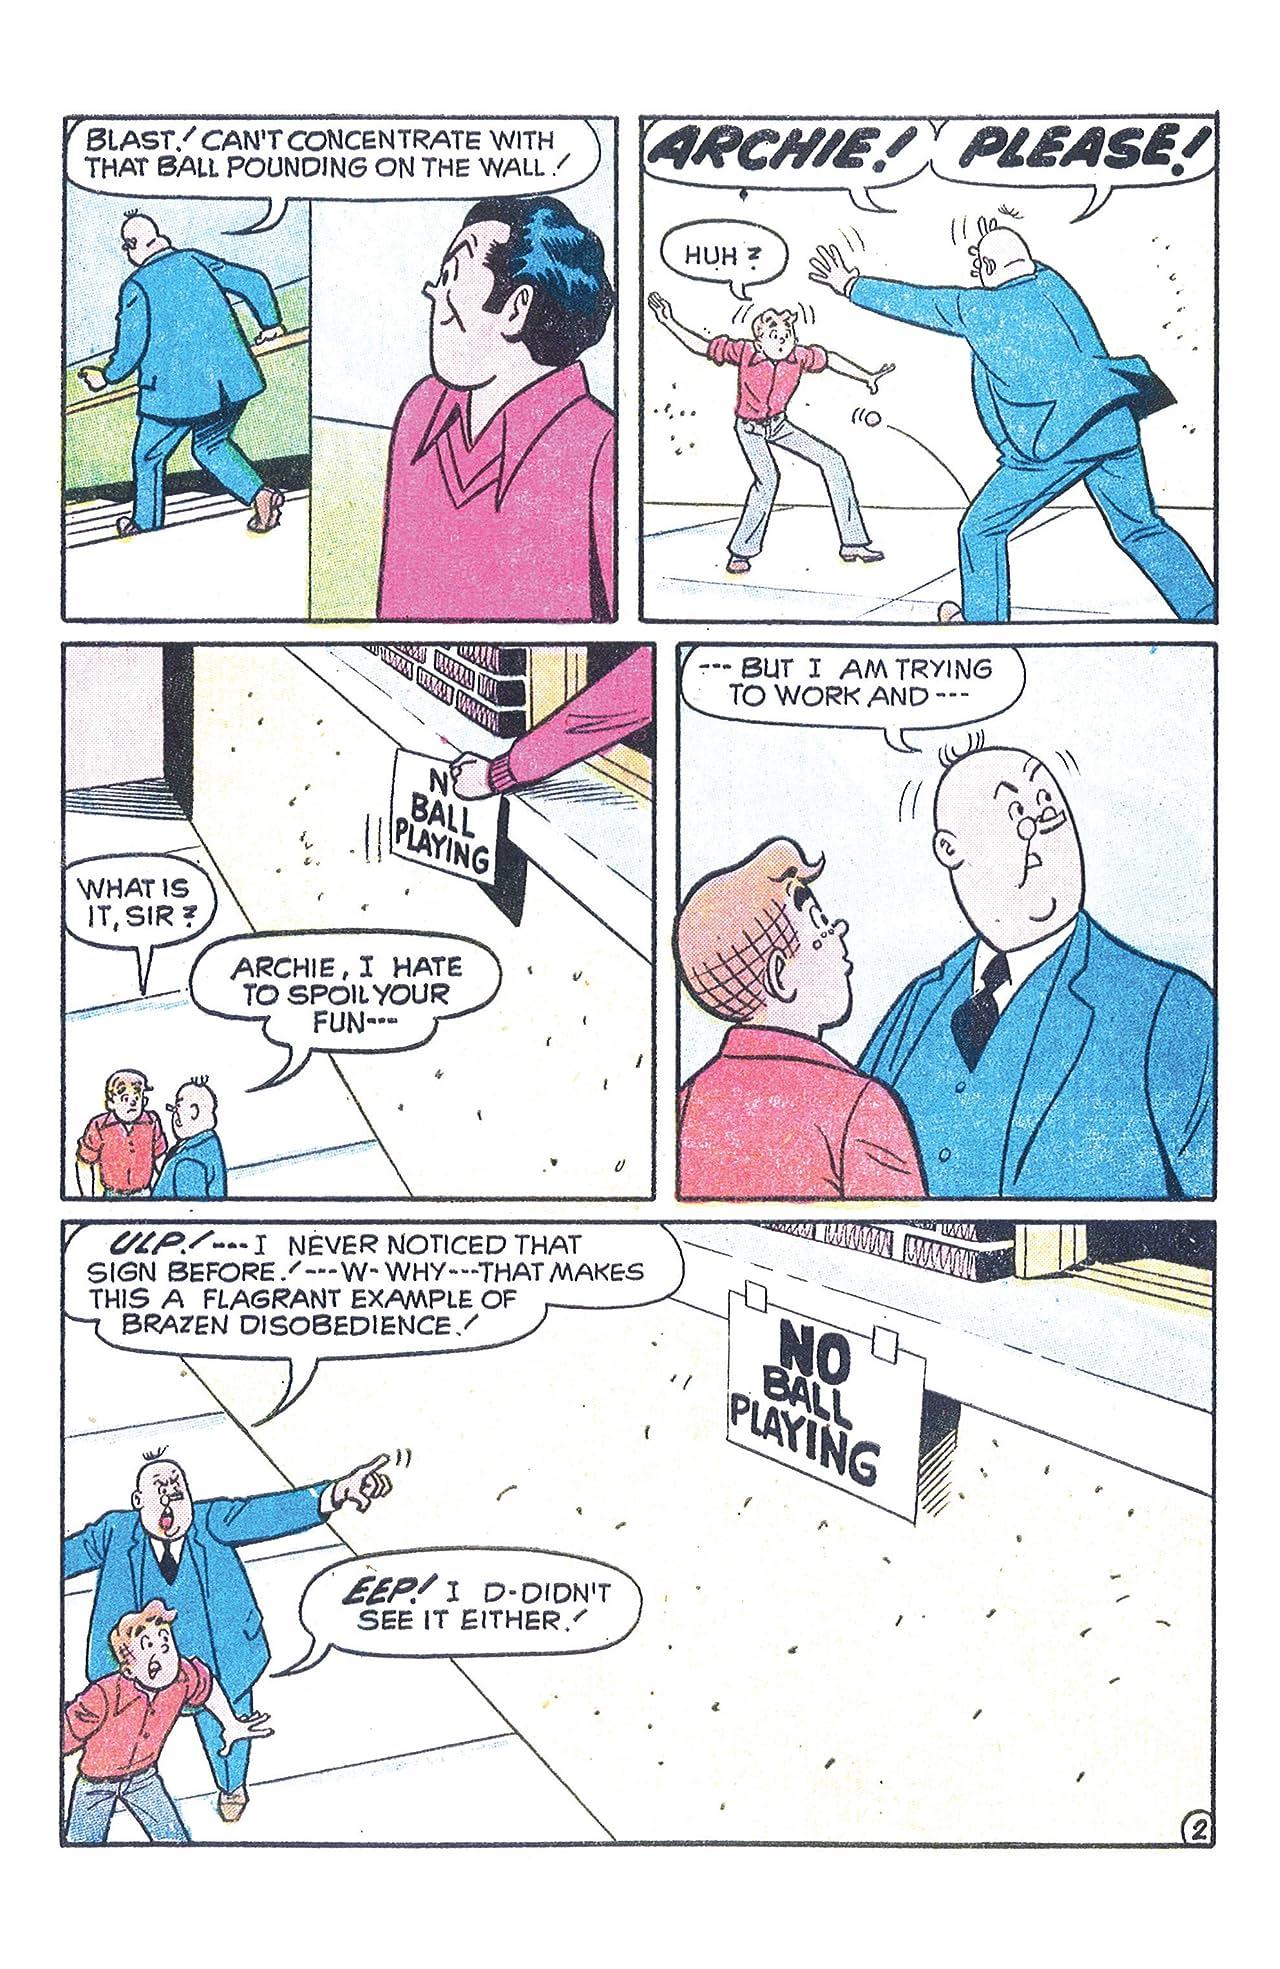 Archie #219